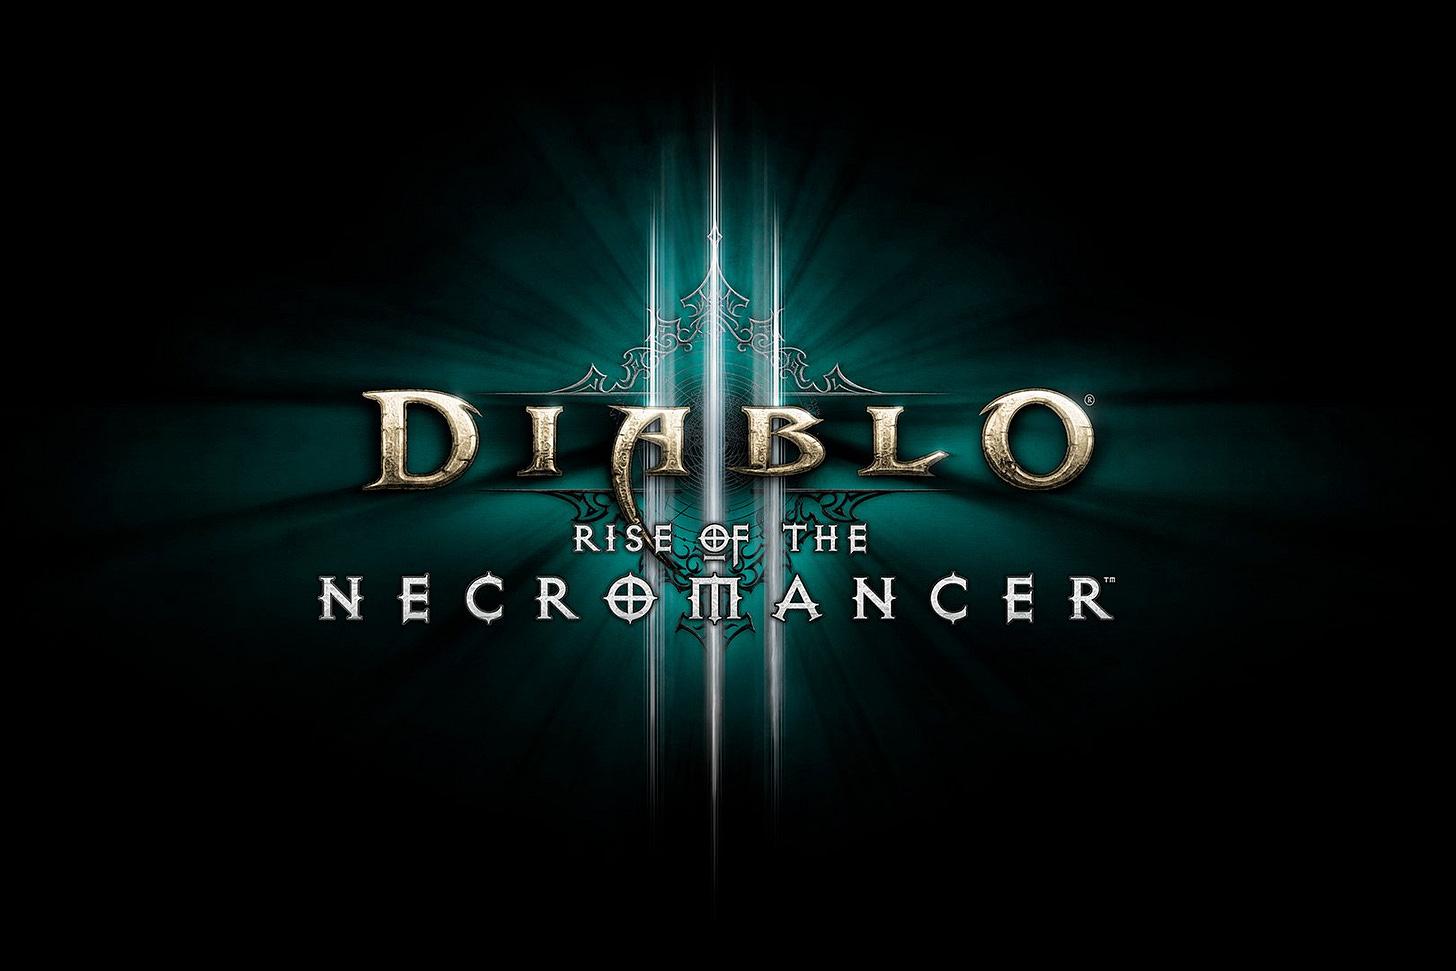 Necromancer Release Date